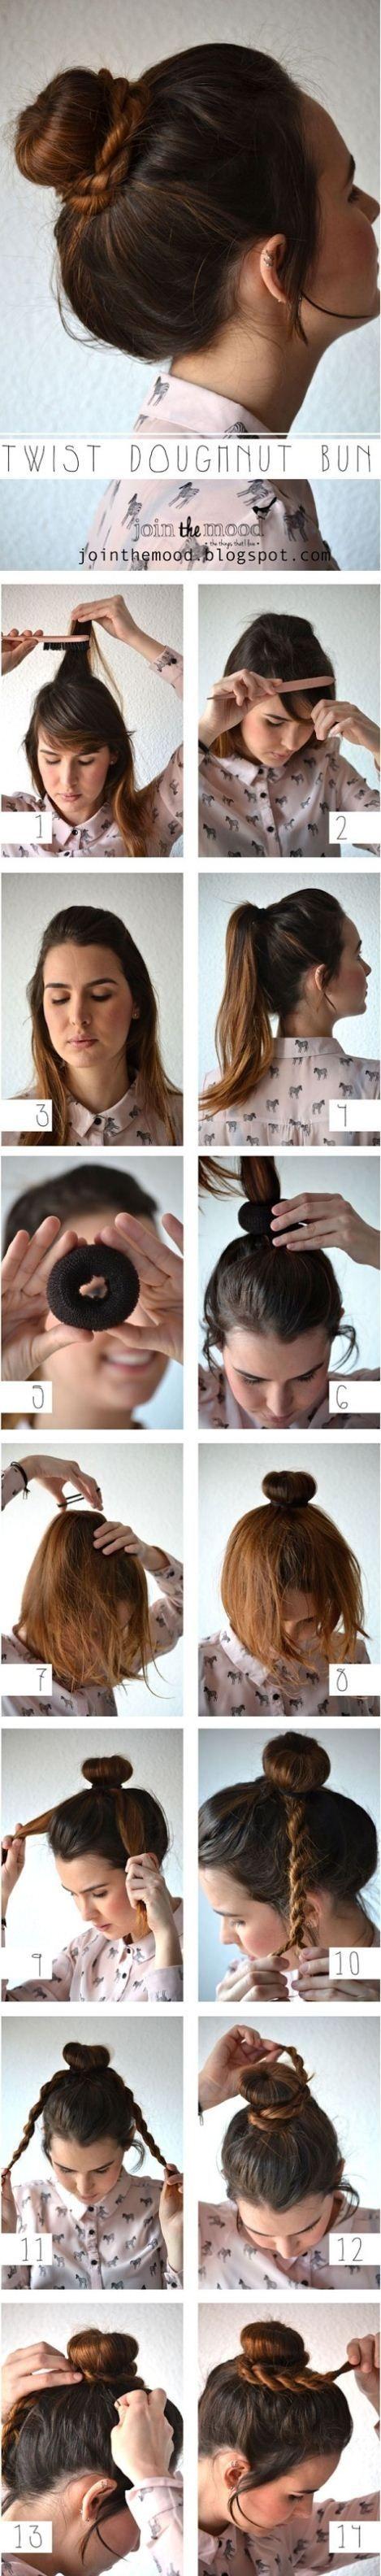 Do it with a stocking http://rubybox.co.za/hair?utm_source=pinterest.com_medium=hair+tutorials_campaign=ruby+hair